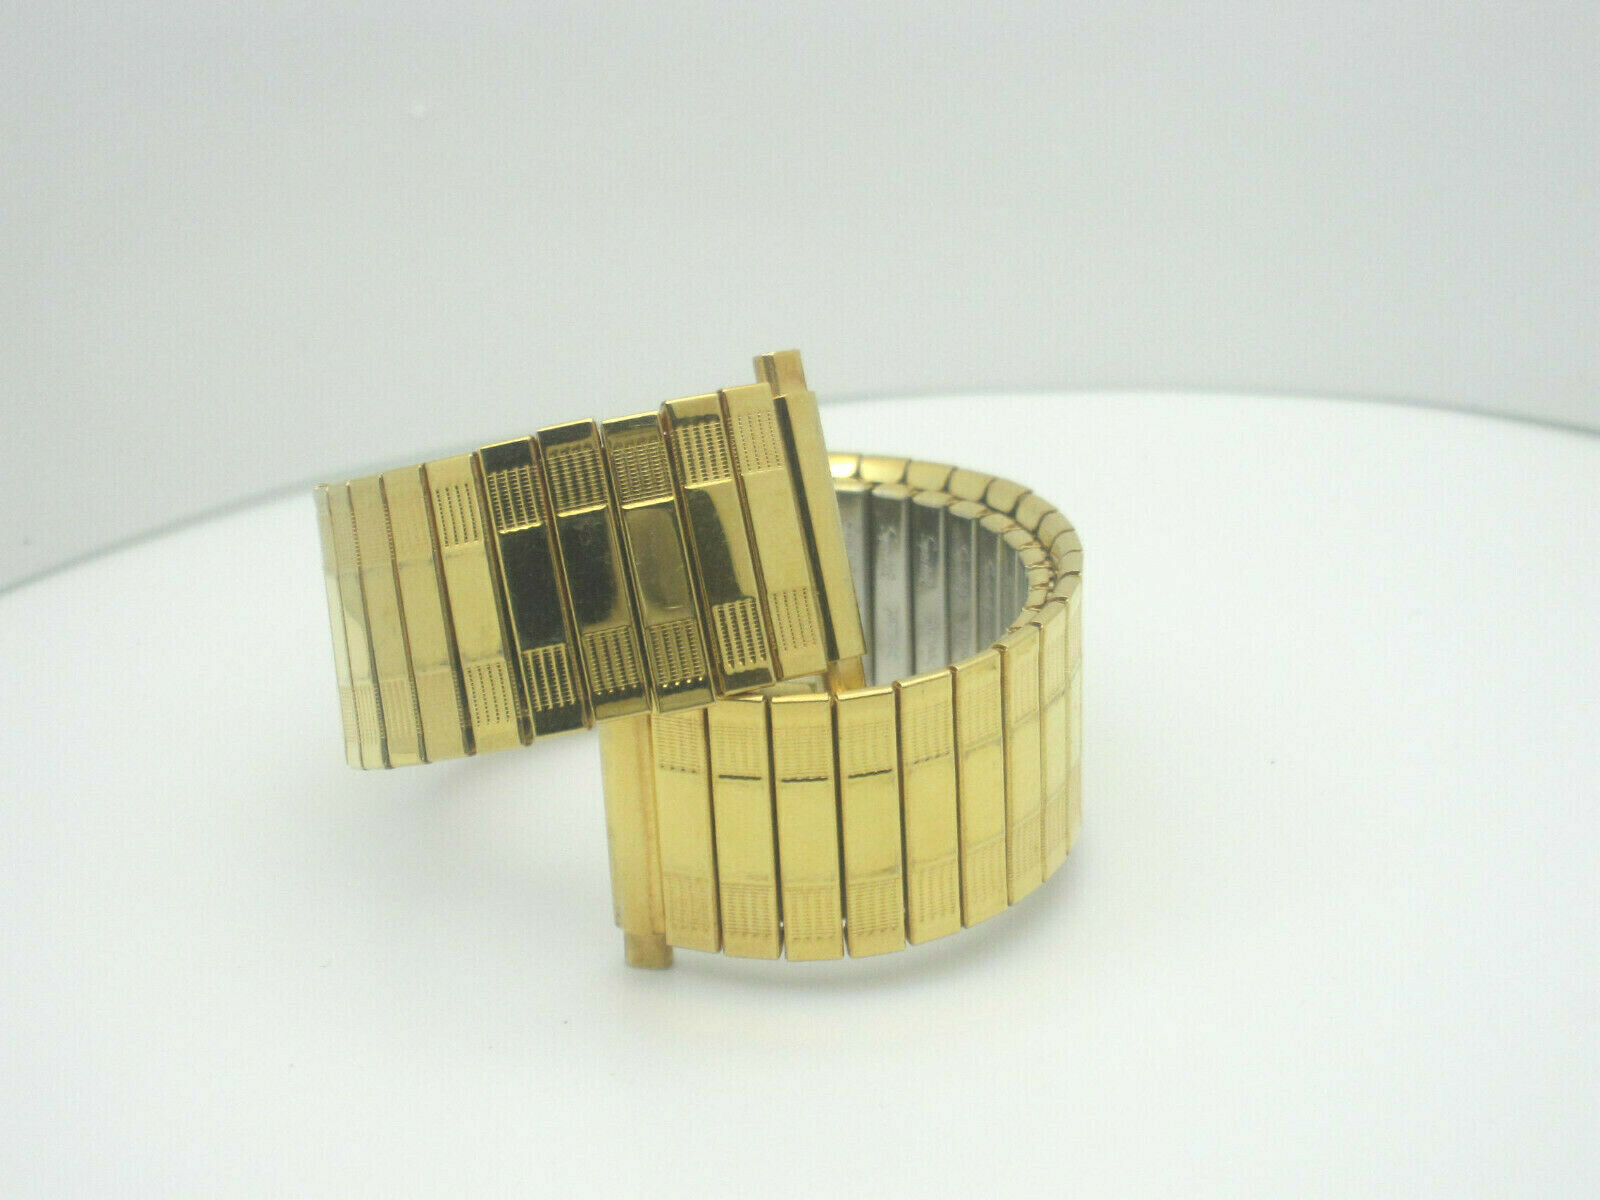 New Speidel Stainless Steel Watch Wrist Band Strap (19 mm) - $25.74